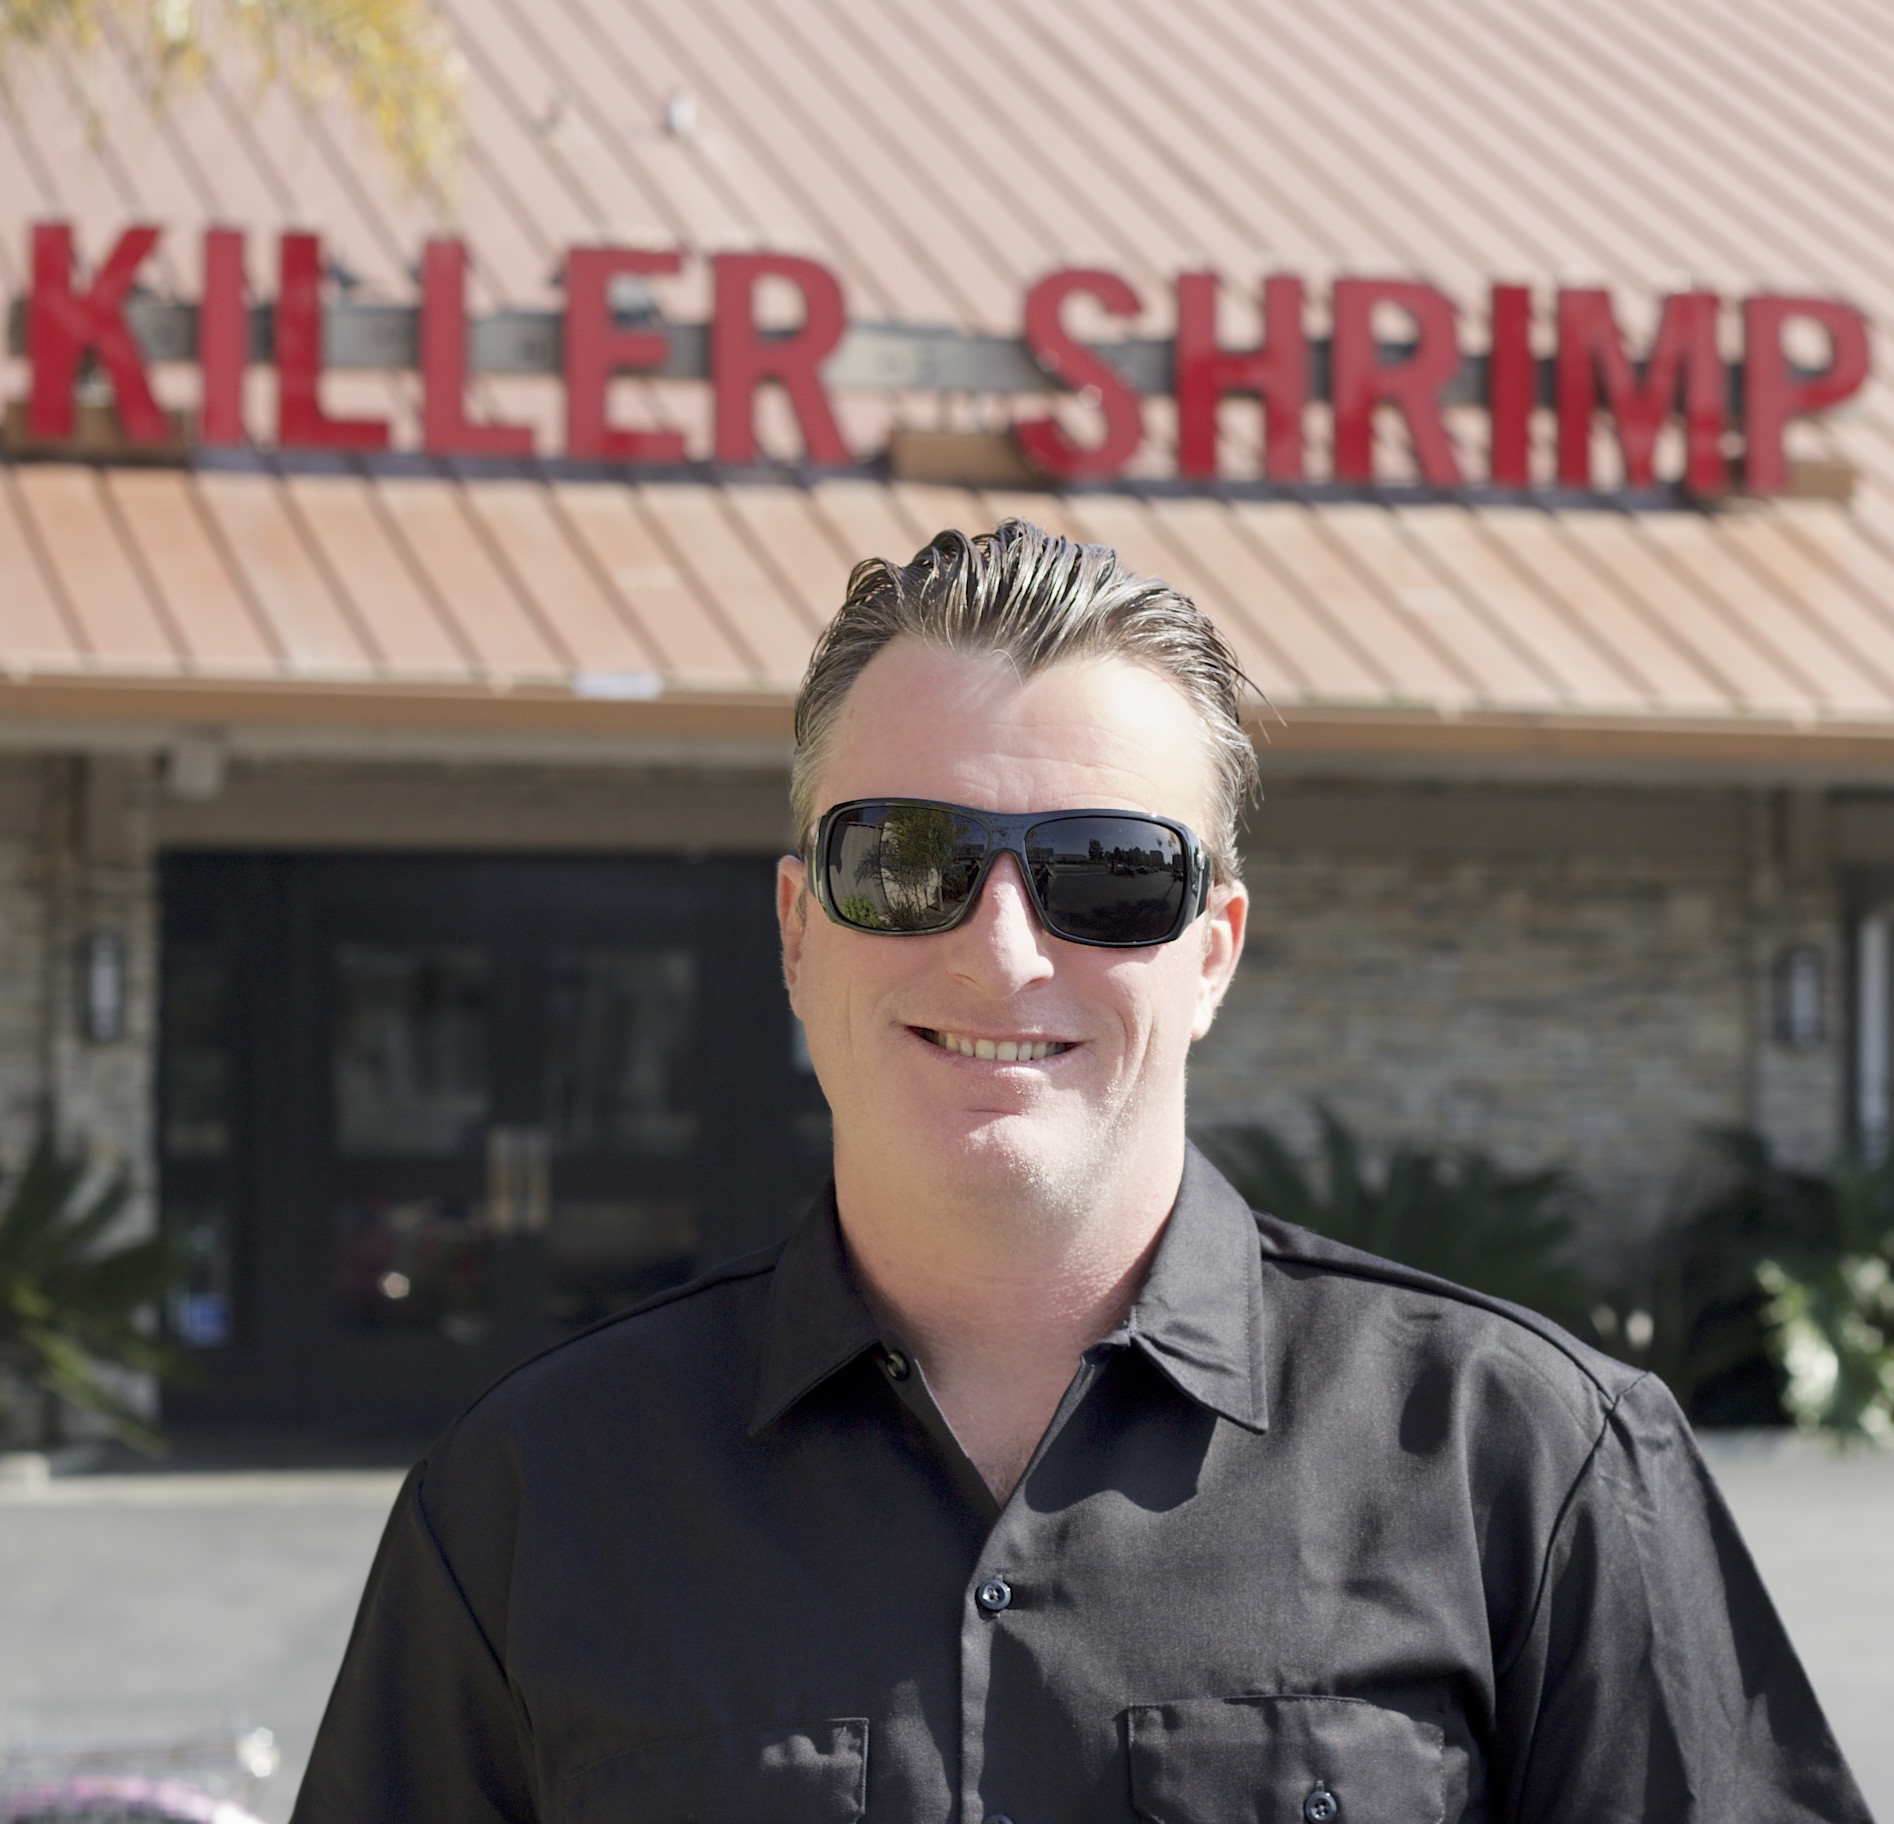 Killer Shrimp is Cool in Marina Del Rey